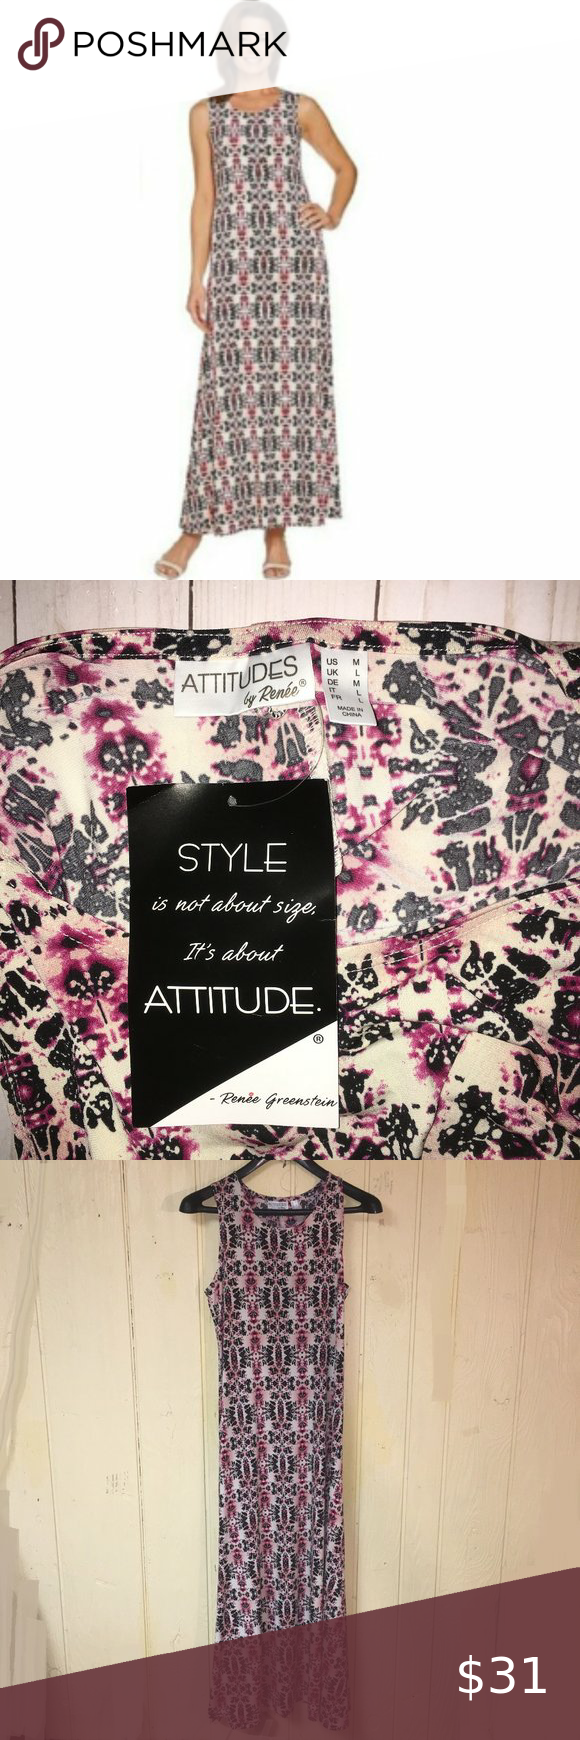 New Qvc Attitudes By Renee Maxi Dress Geometric New With Tags Attitudes By Rene Greenstein Designer Brand Women Maxi Dress Clothes Design Printed Maxi Dress [ 1740 x 580 Pixel ]